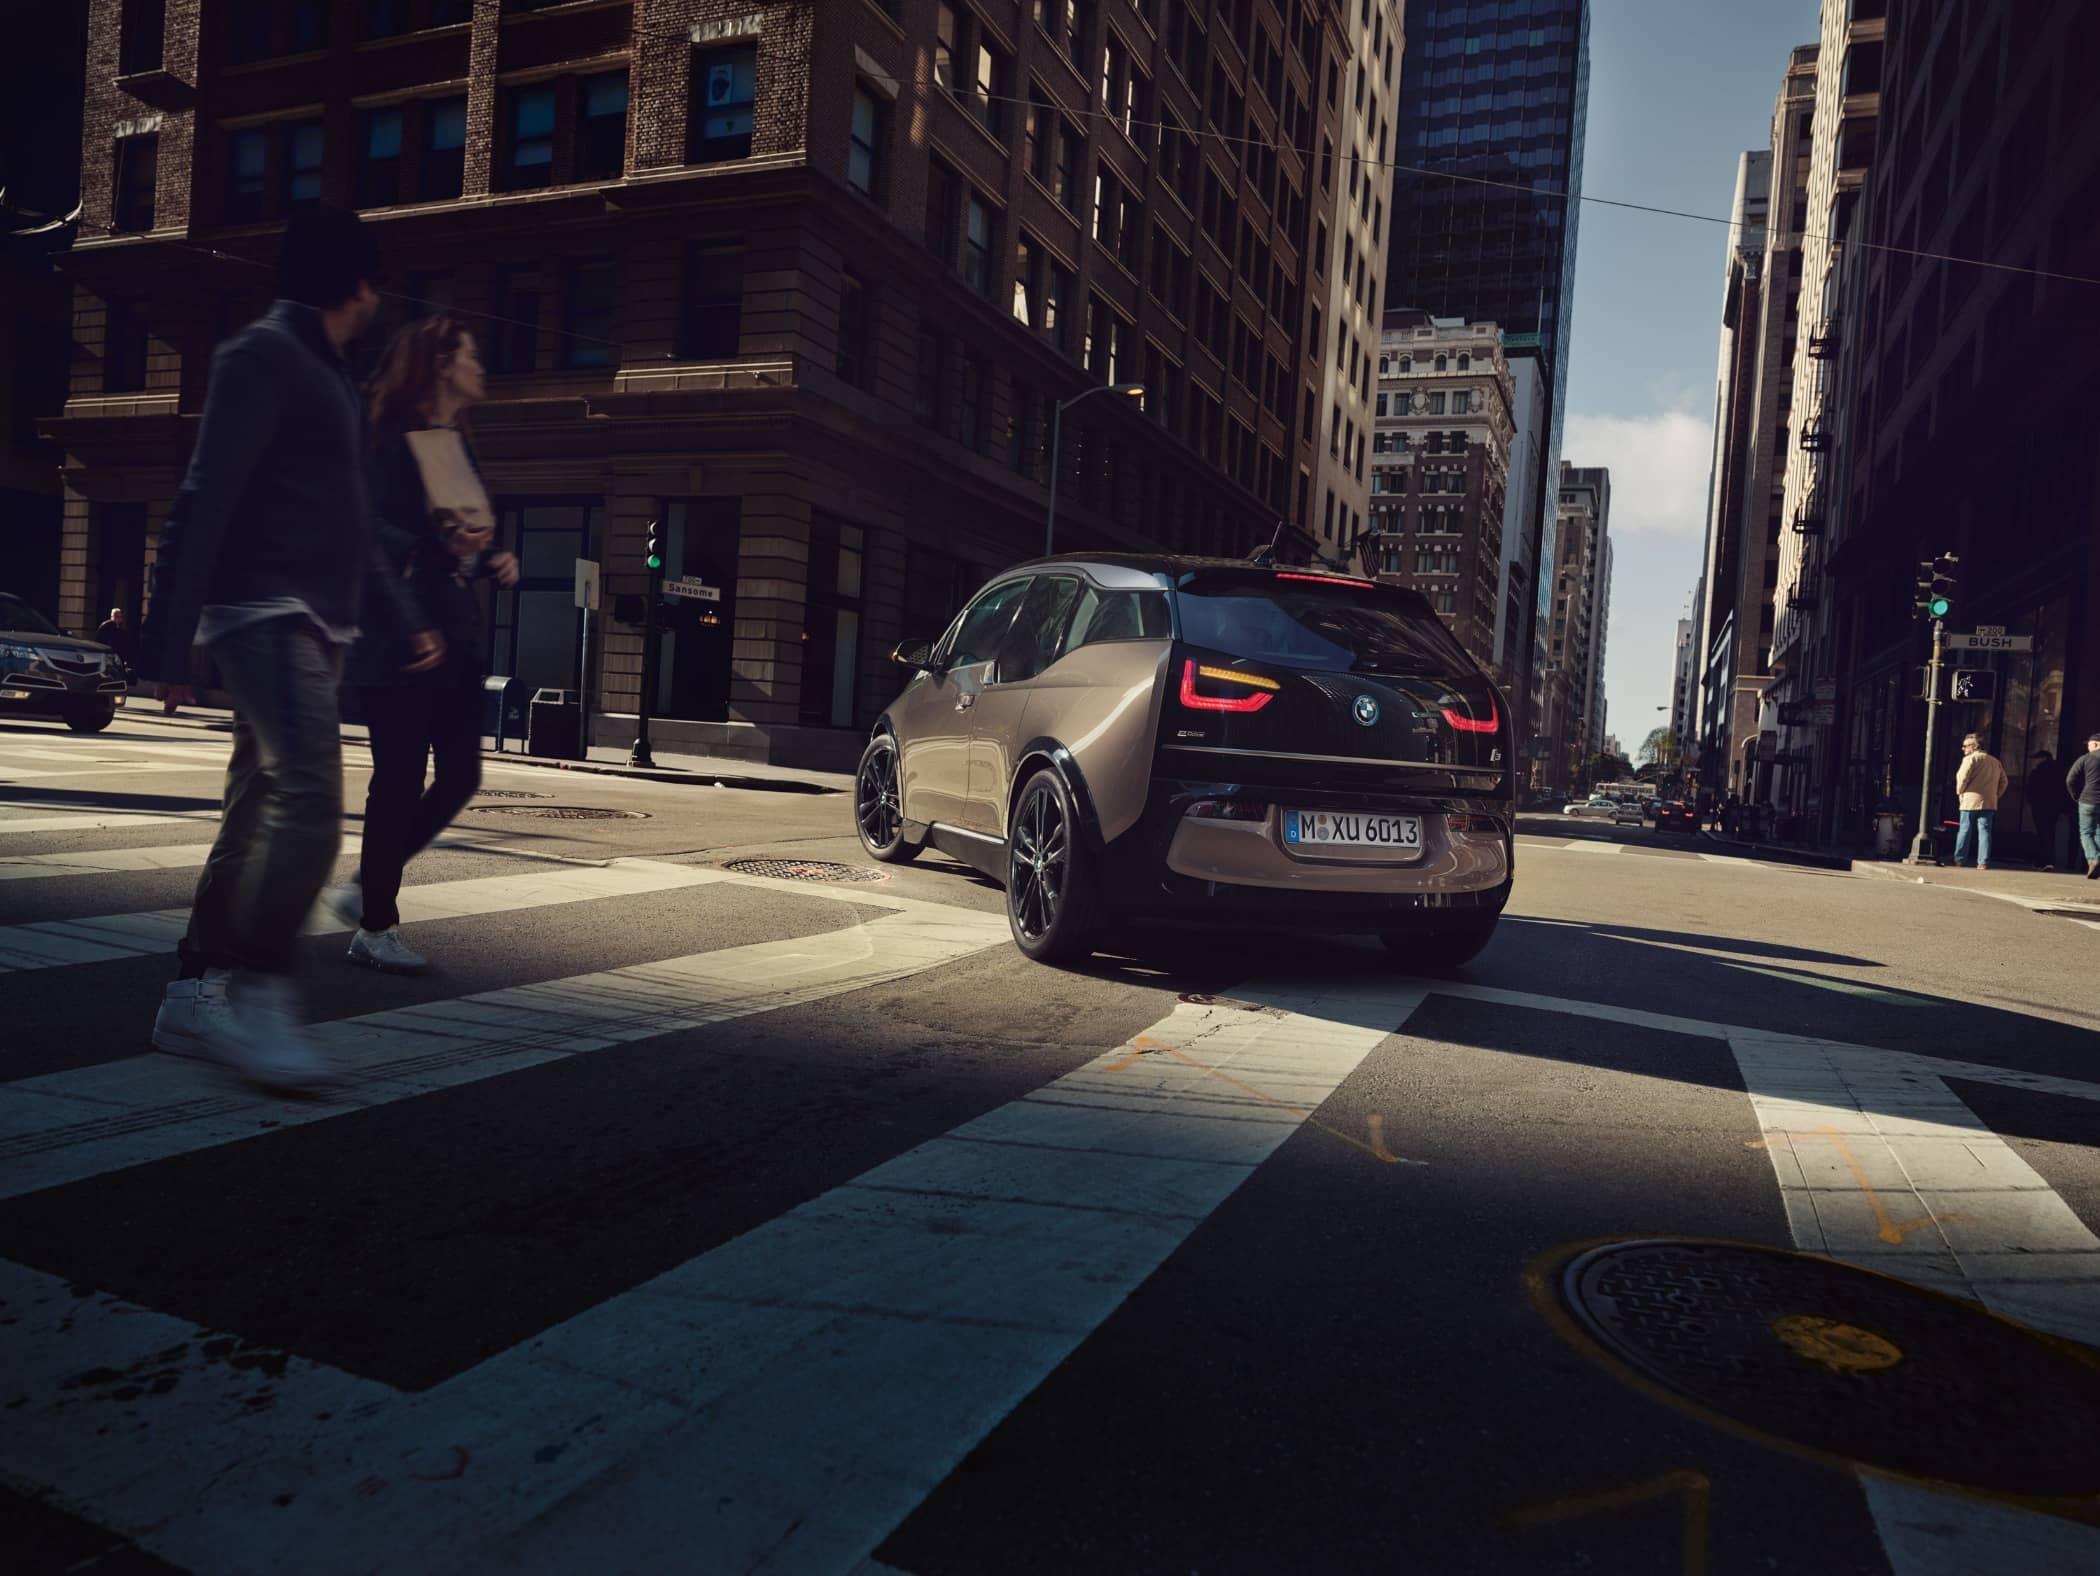 Mode of transport, Urban area, Automotive design, Land vehicle, Lane, Street, Road, Car